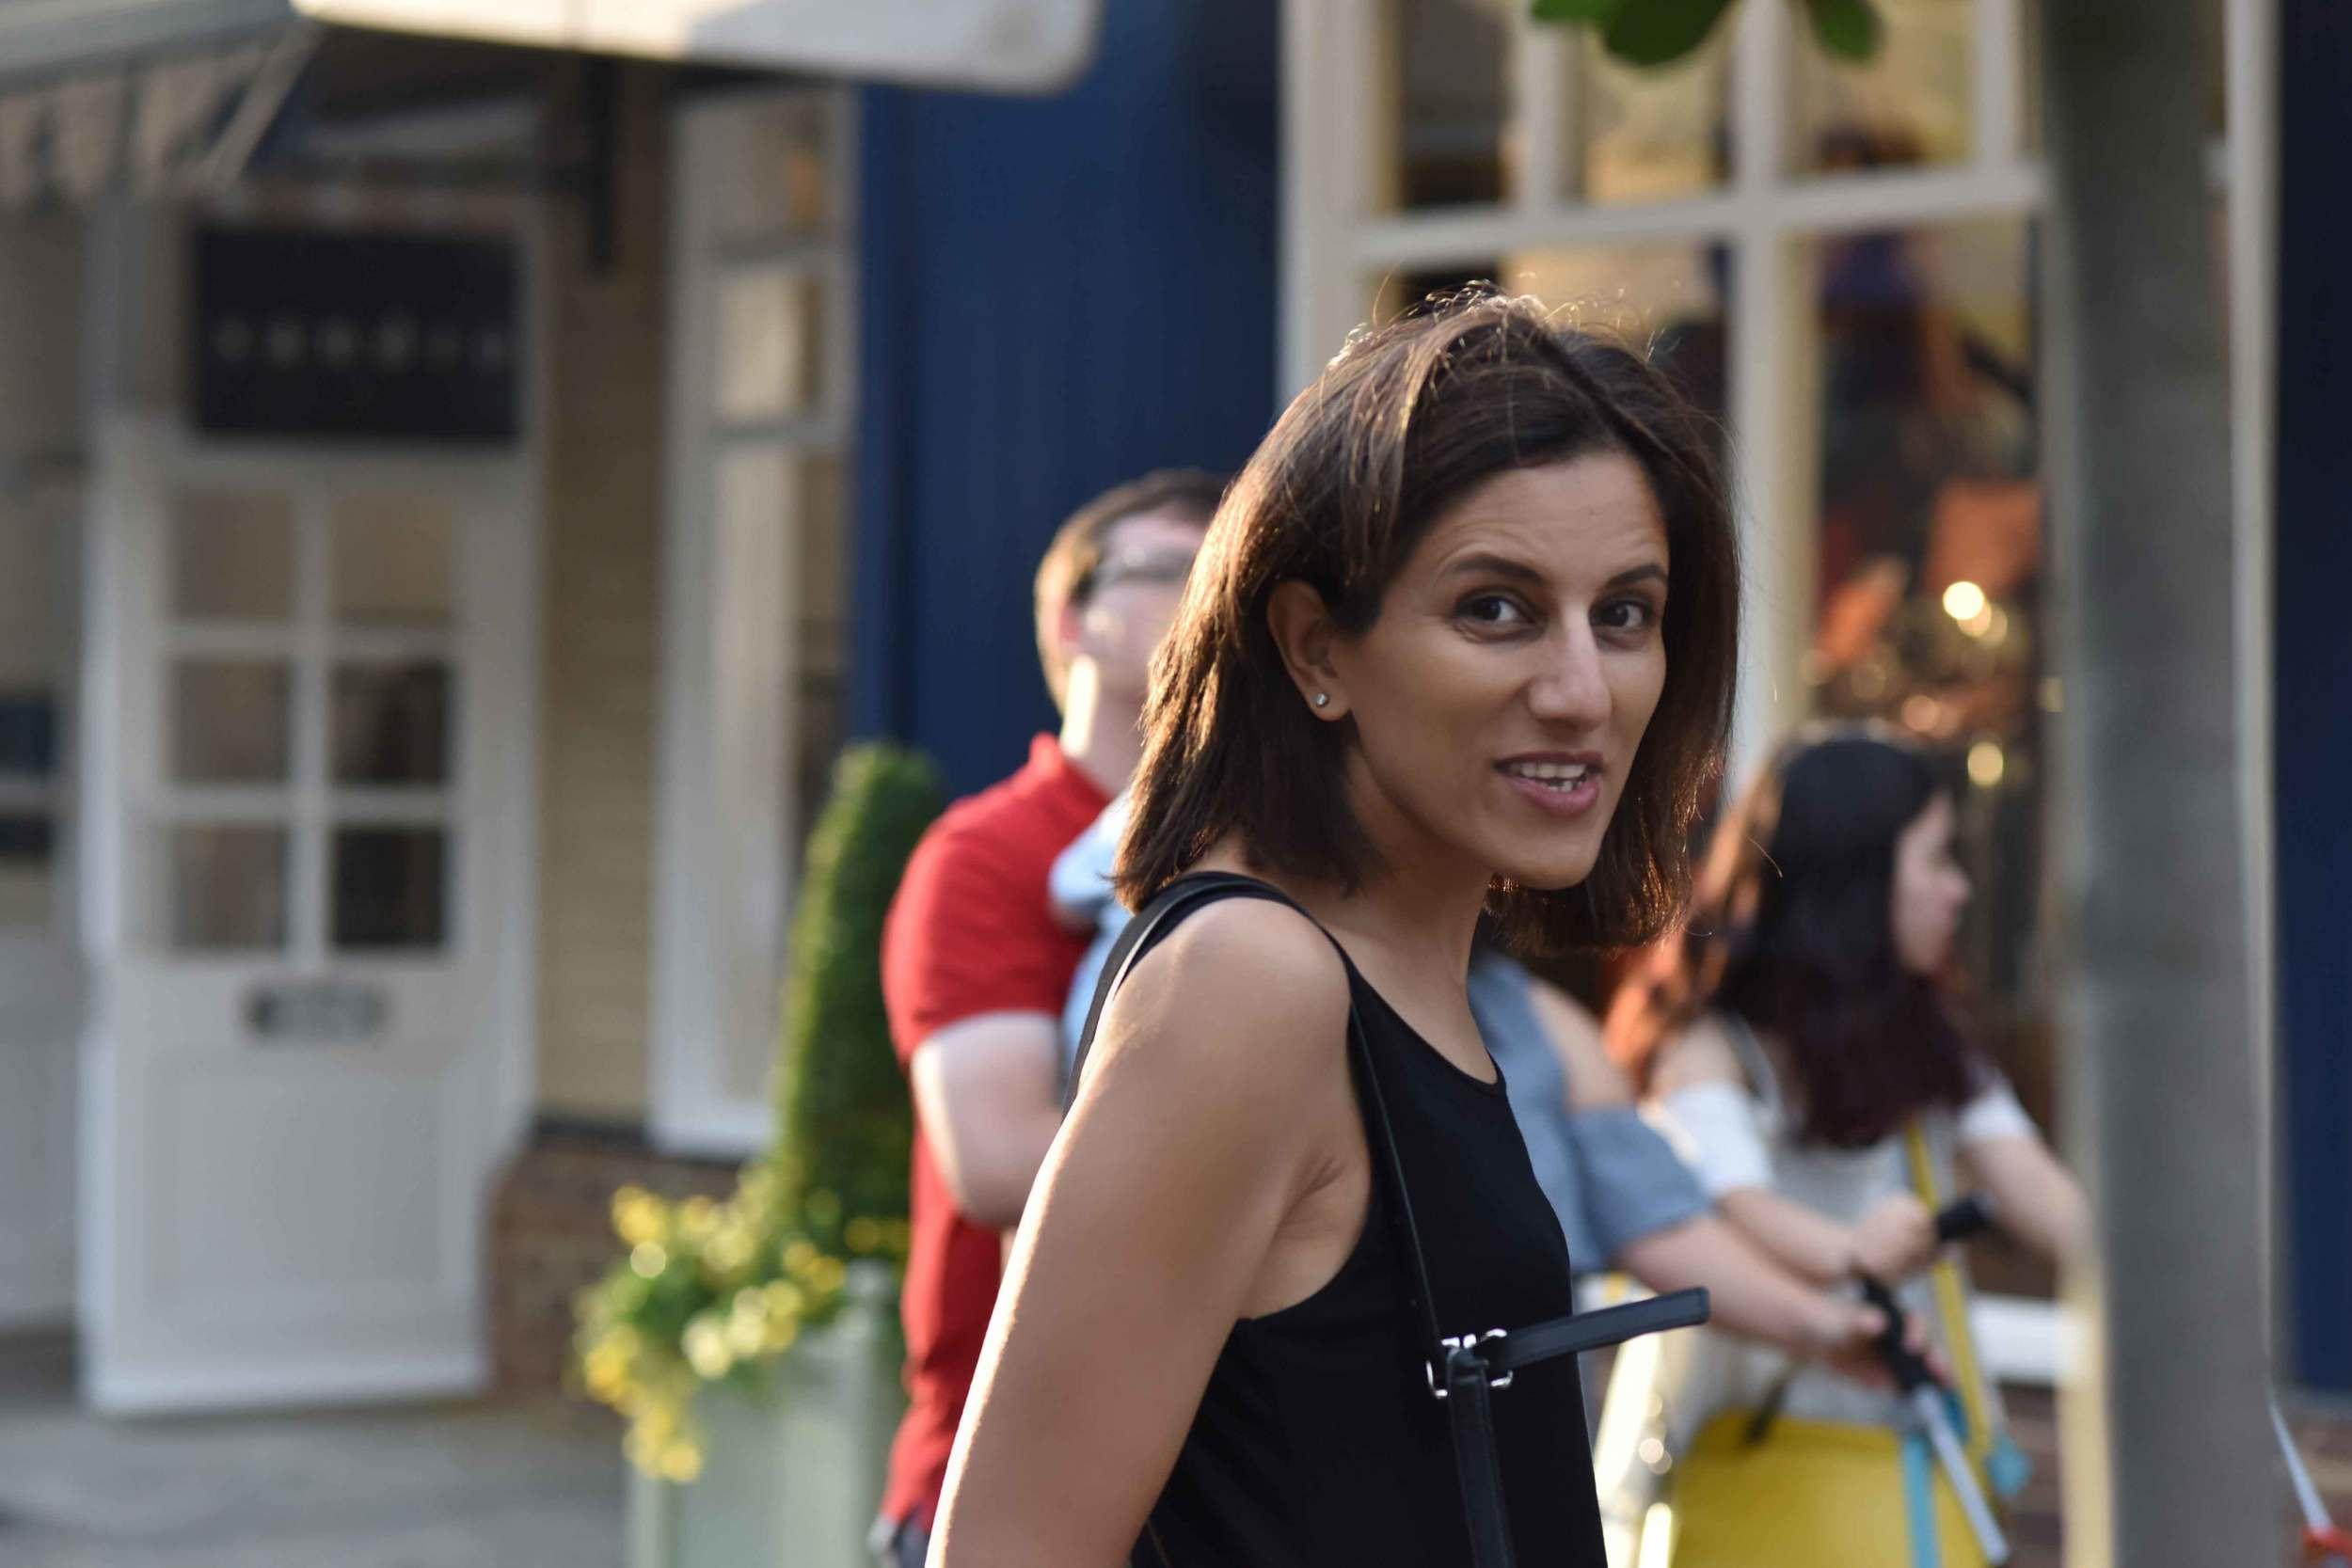 Eileen Fisher jersey tank dress, Bicester village, designer shopping outlet near London, UK. Image©sourcingstyle.com